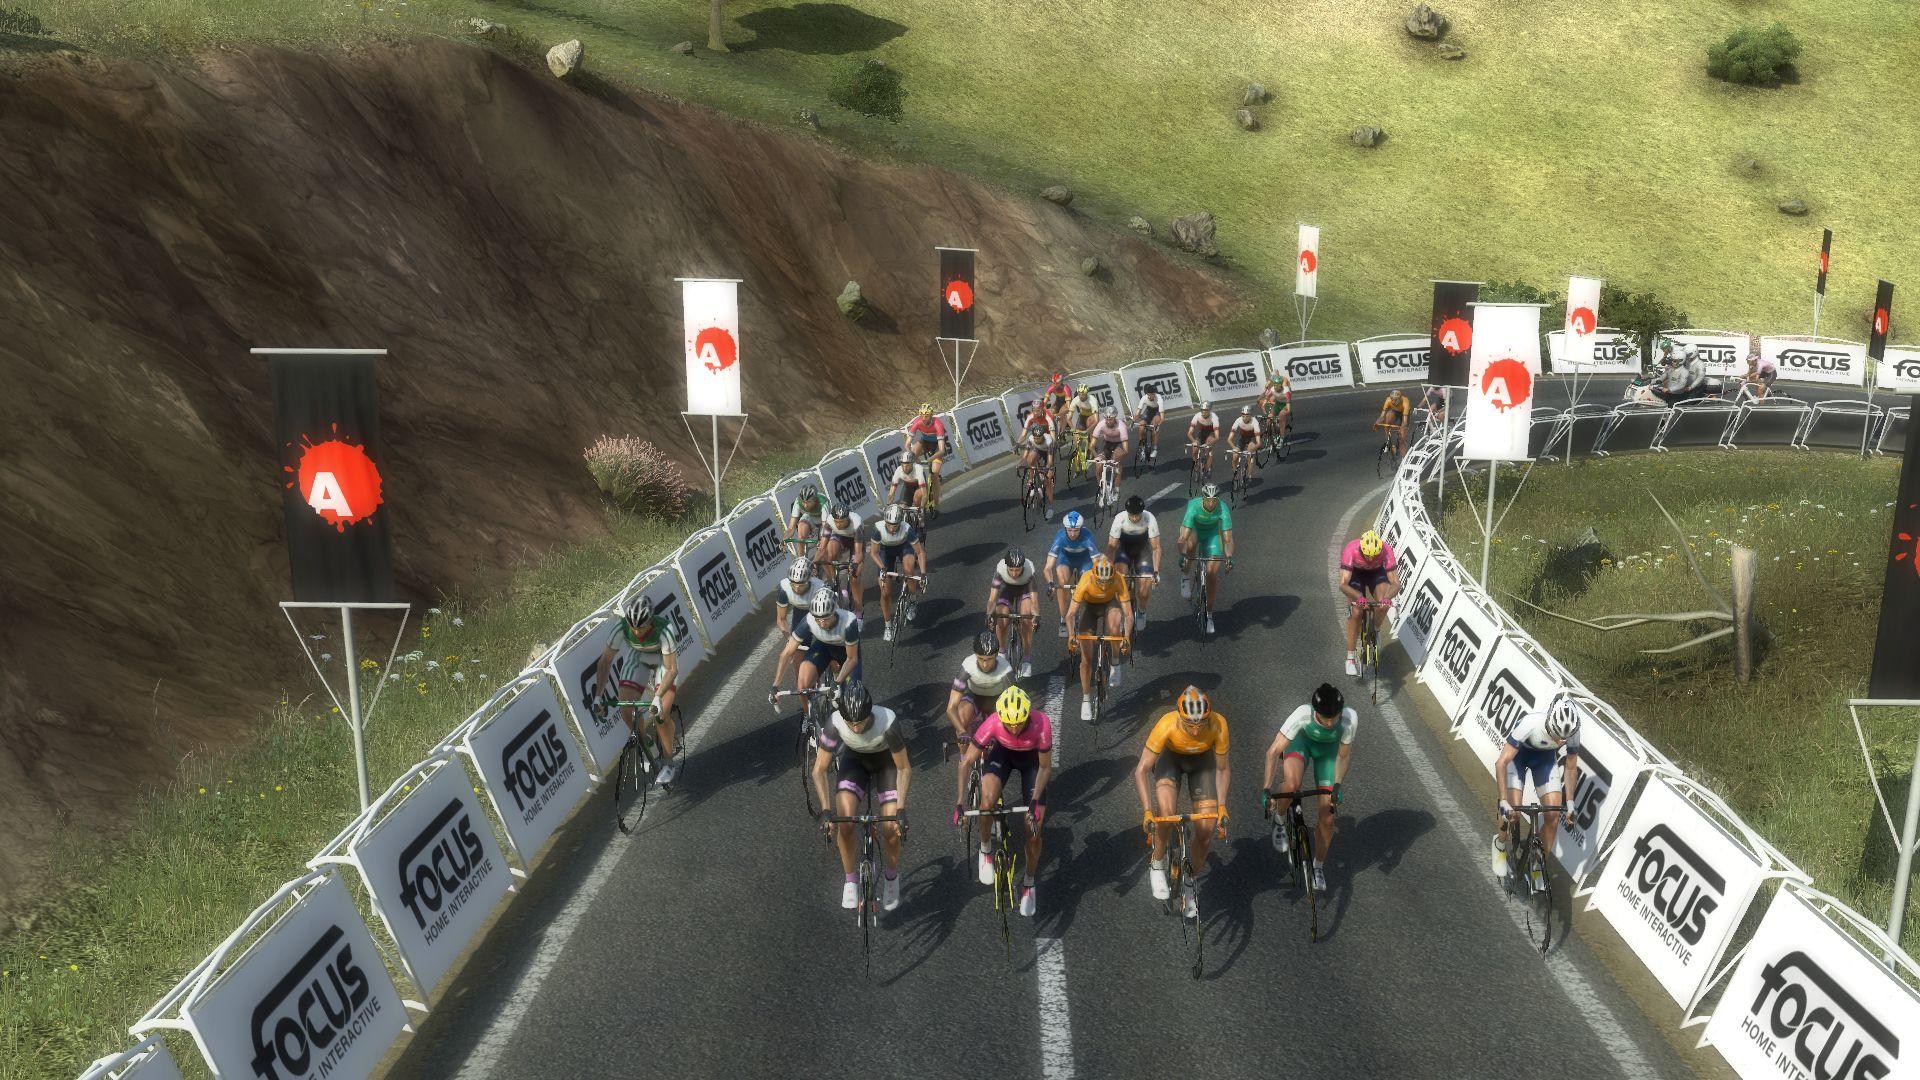 pcmdaily.com/images/mg/2019/Races/C2/Gisborne/Gisborne%2013.jpg